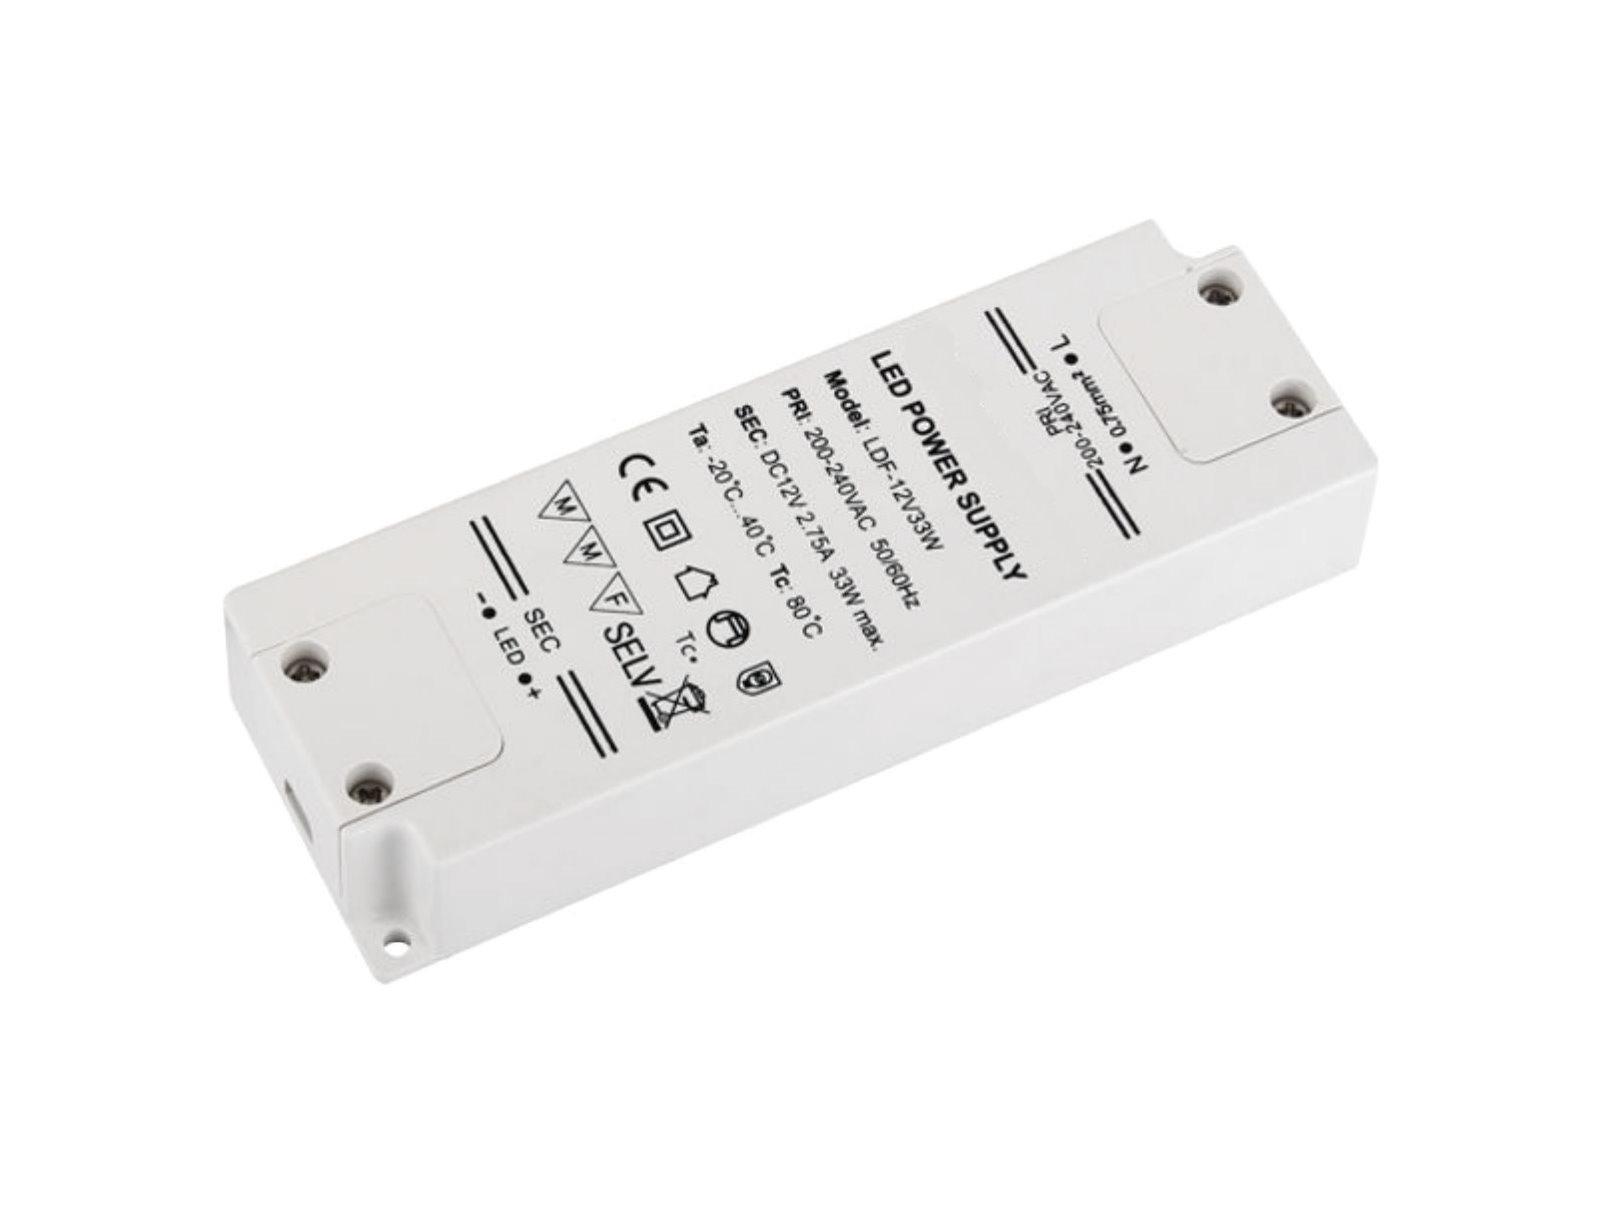 LED Transformator Kompakt 12V - 33W